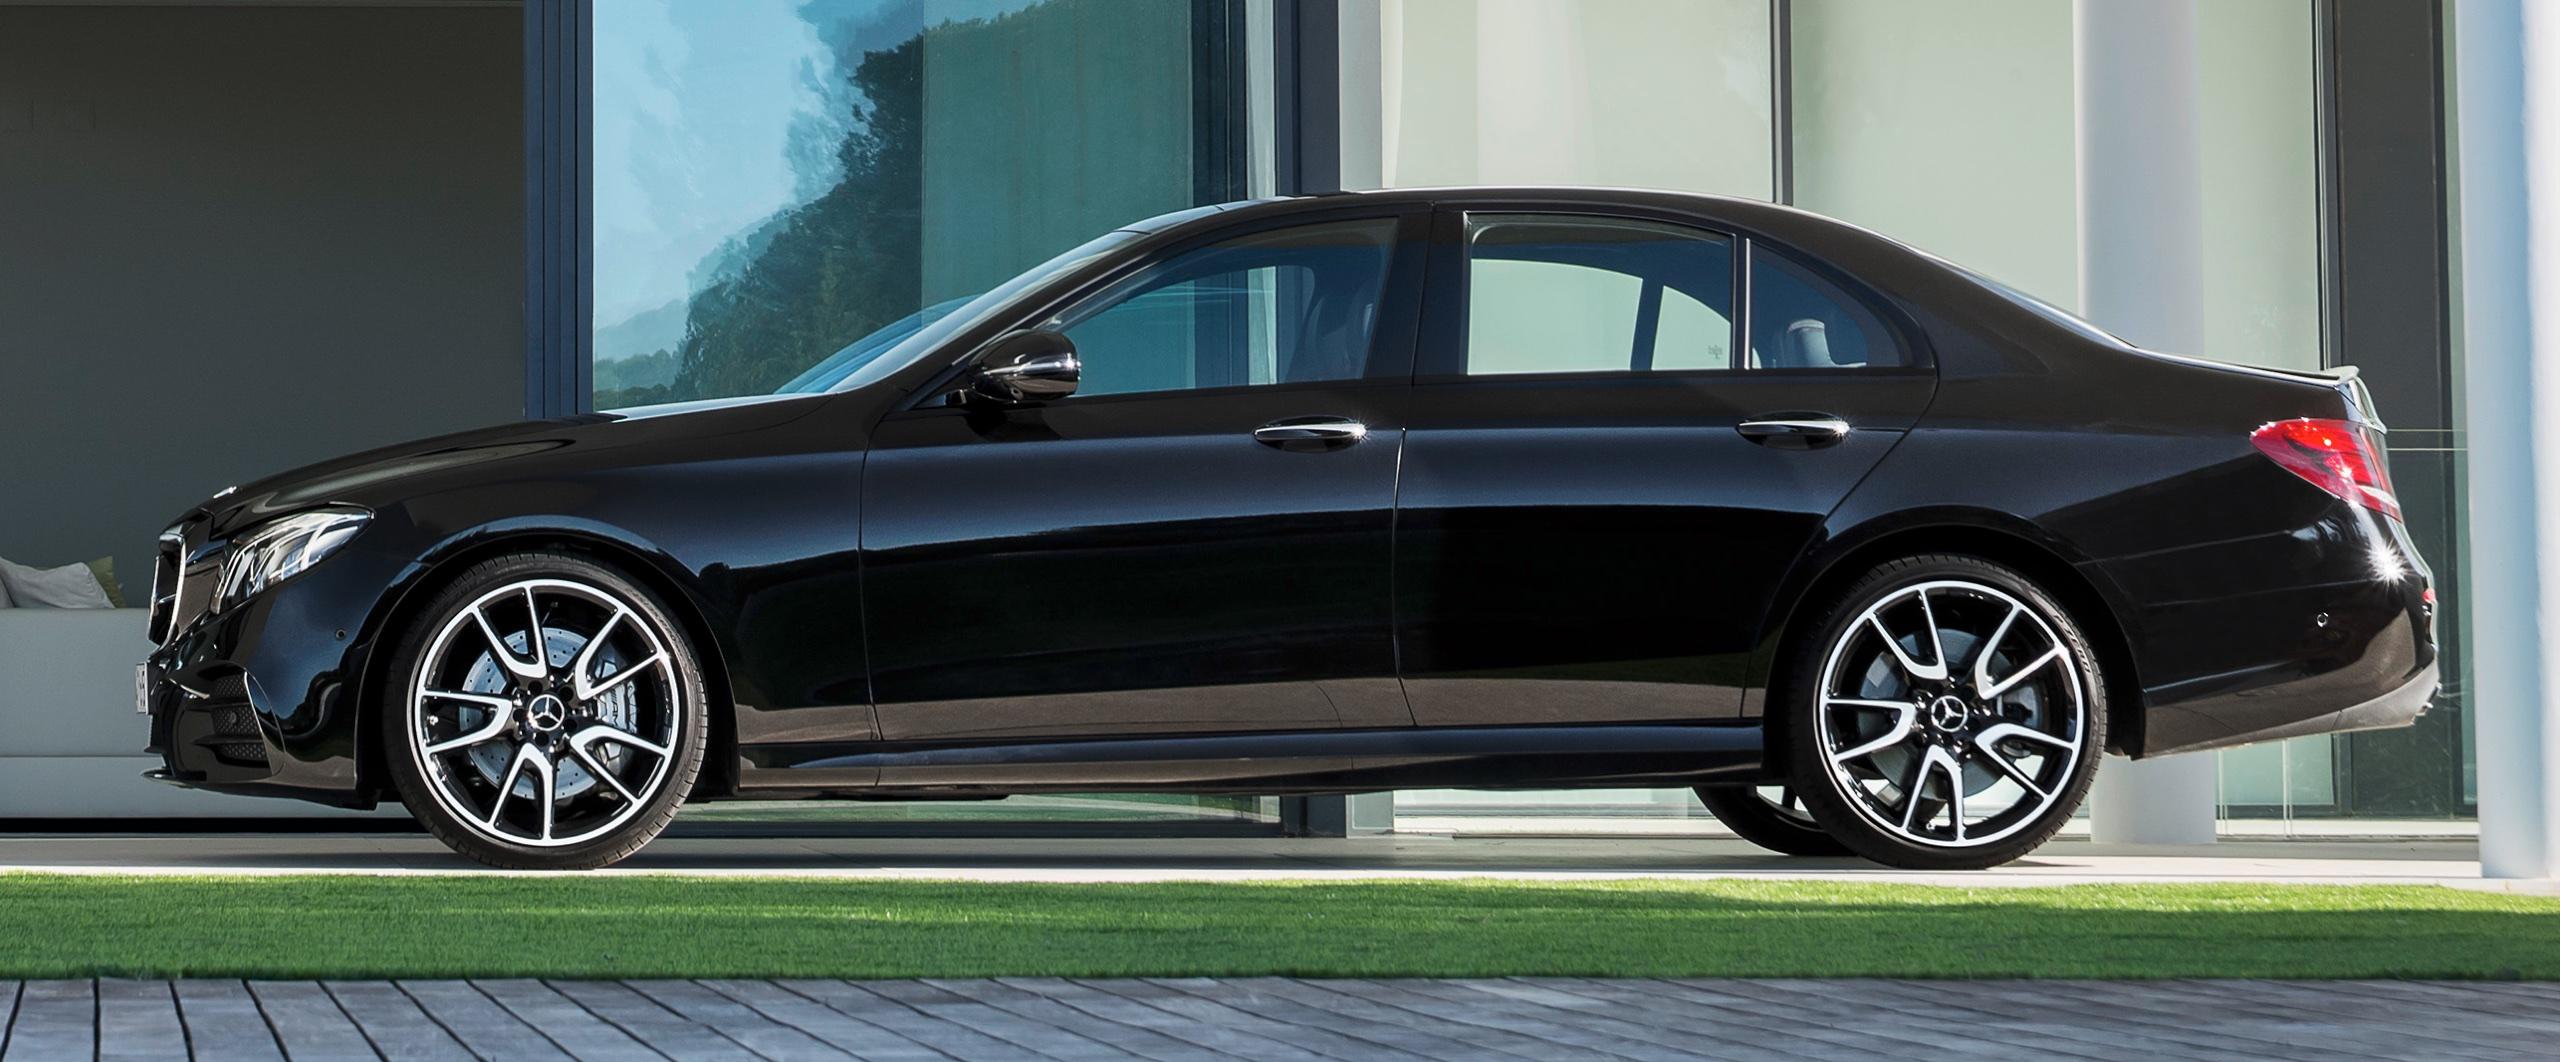 Mercedes amg e43 4matic debuts 401 hp 520 nm image 458860